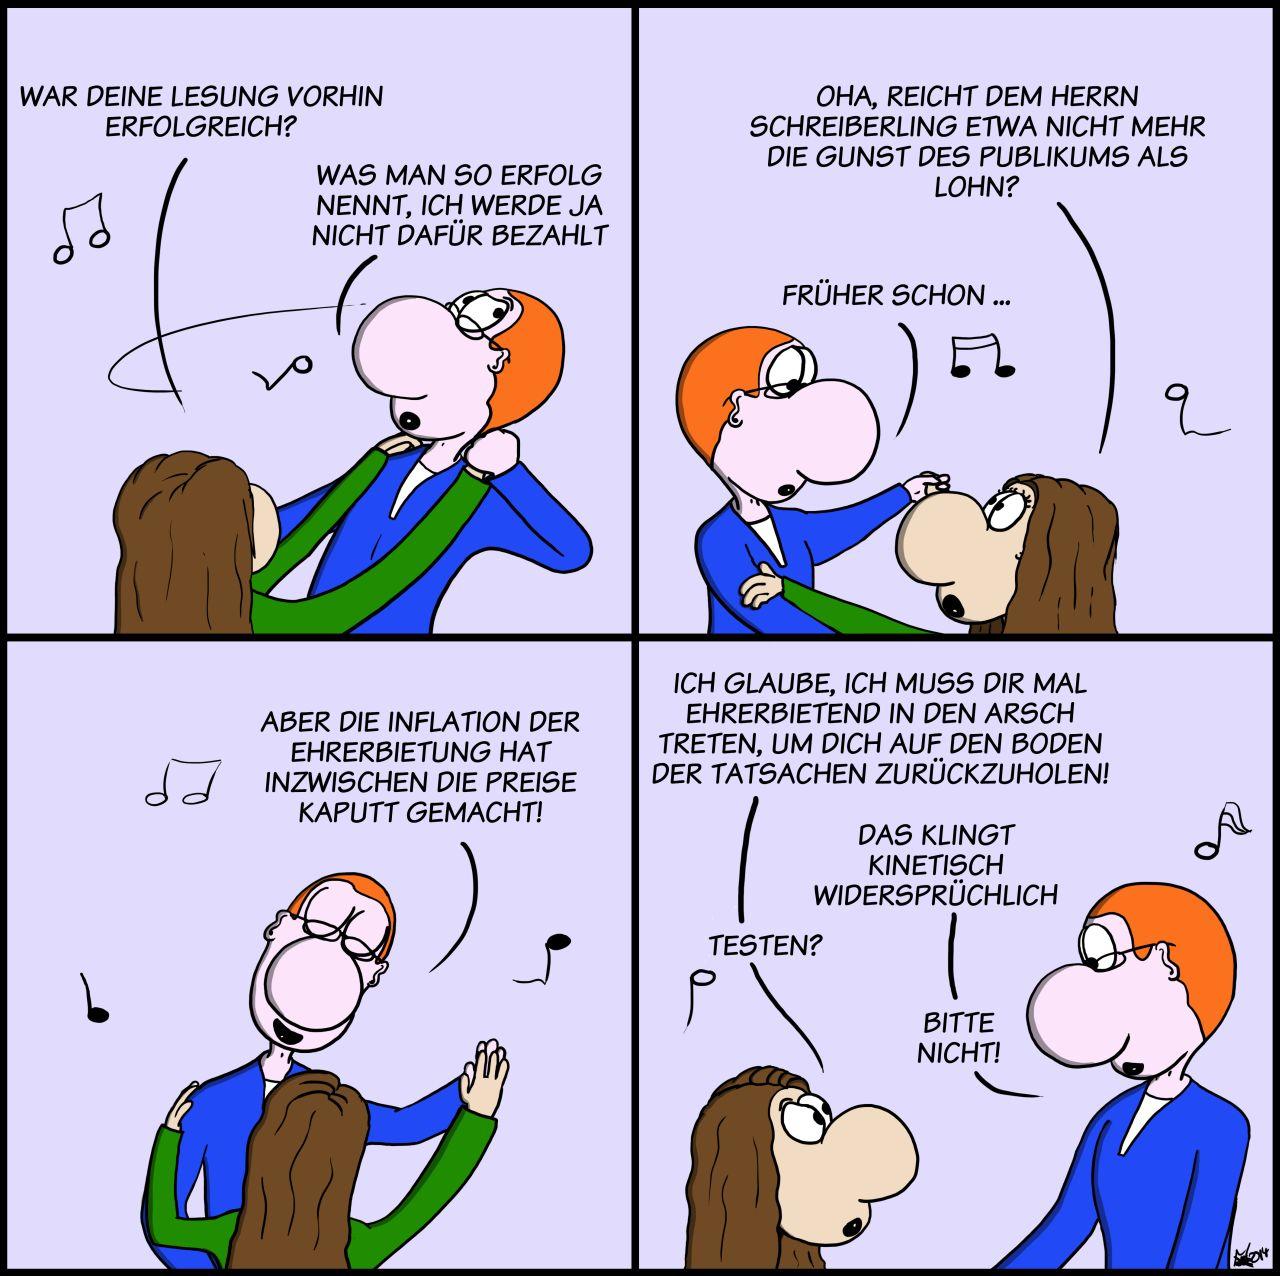 Der Wo Ente: Kinetisch Kontraproduktiv